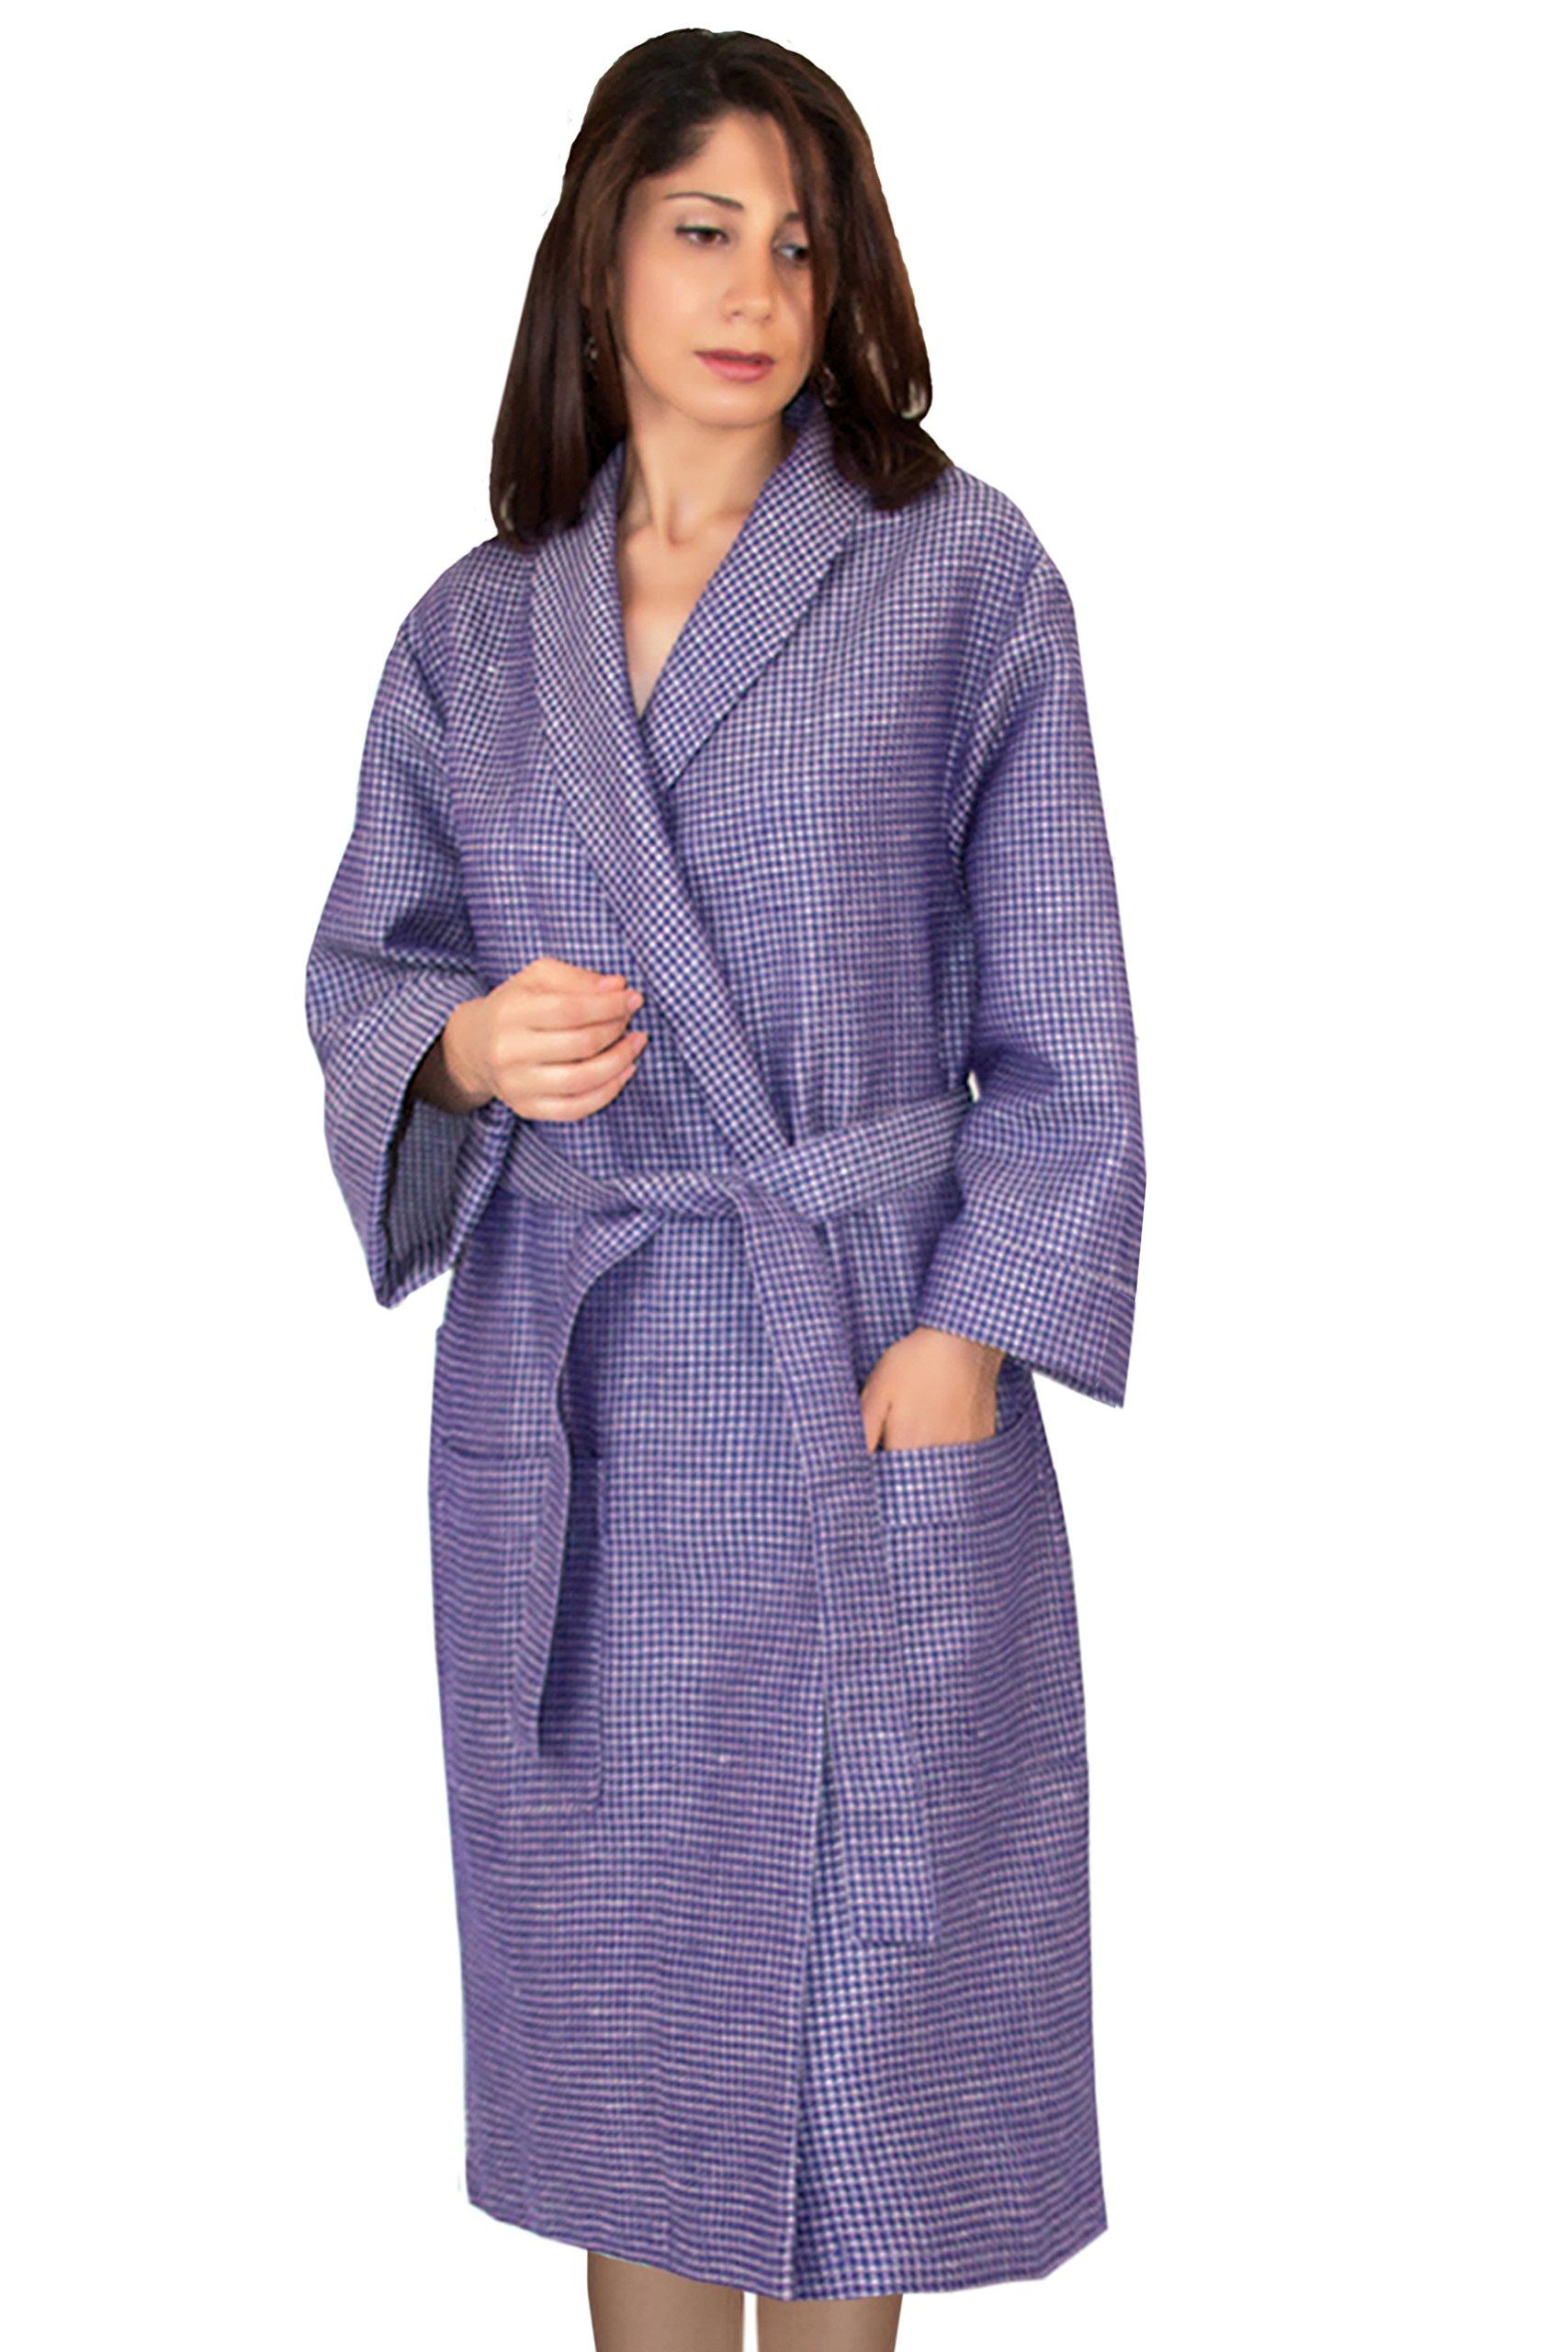 Bath Robe (Large) Linen-Cotton Waffle, Prism Violet-beige